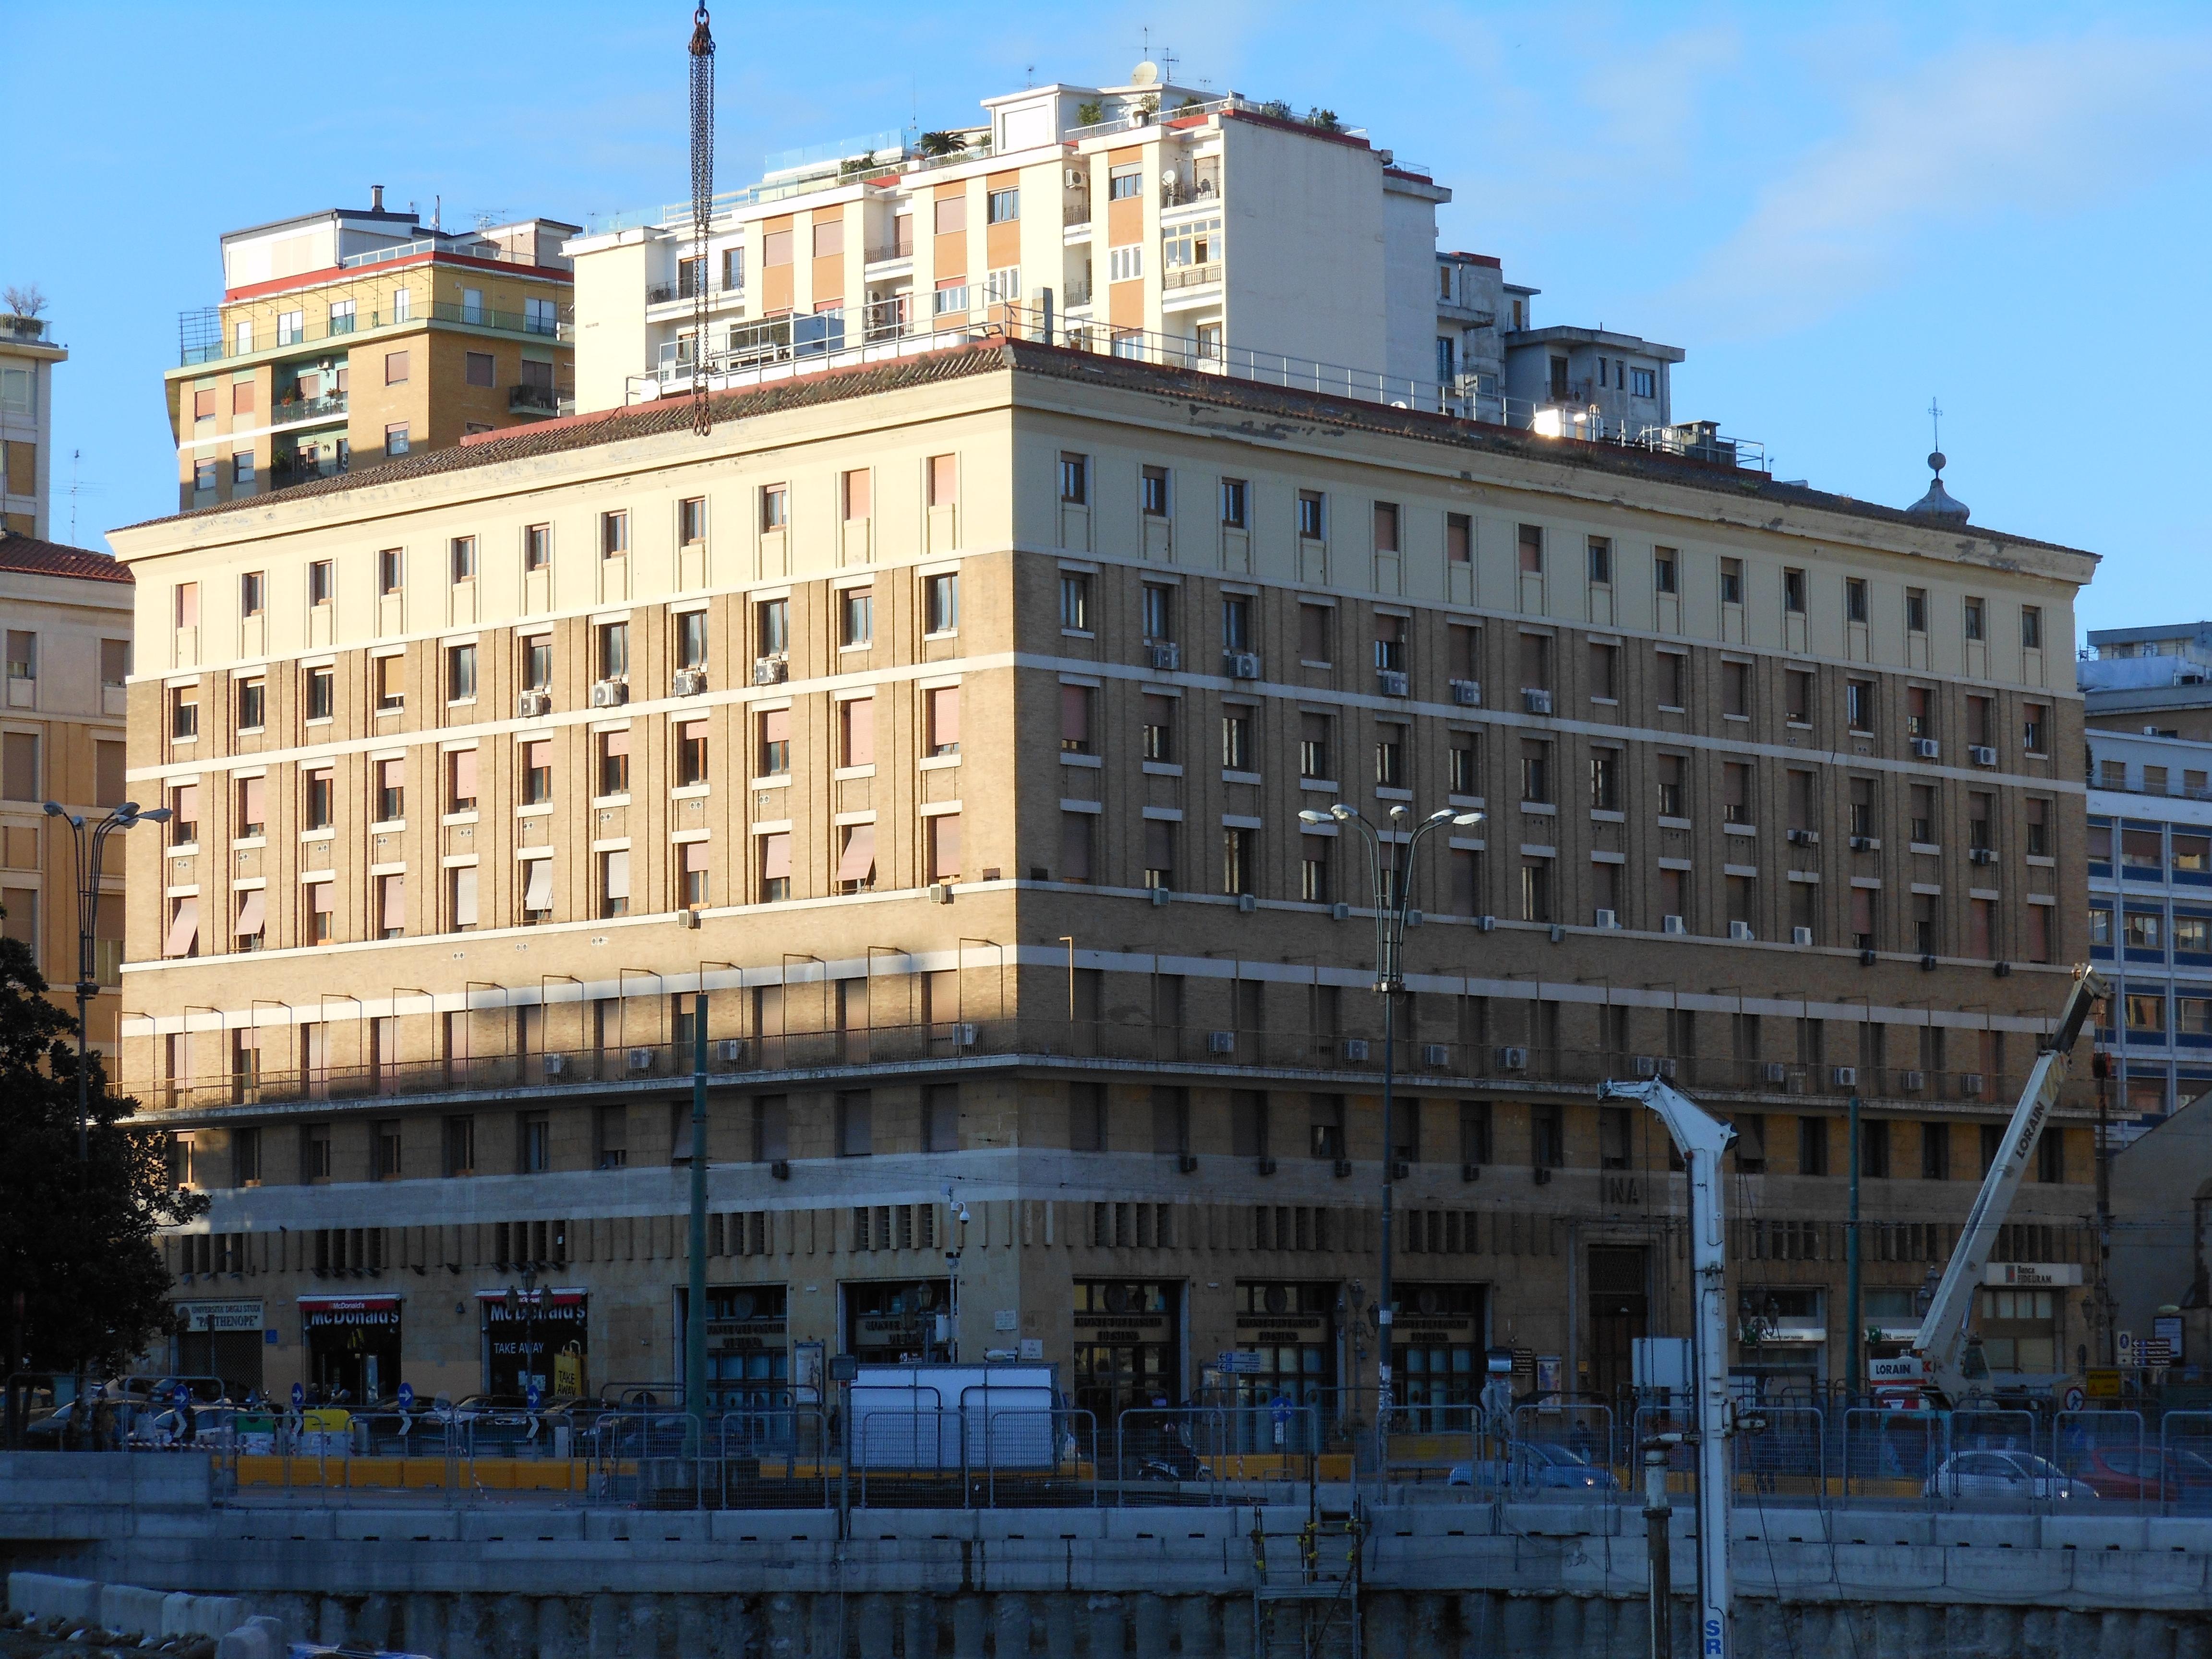 Hotel Ginevra Centro Storico